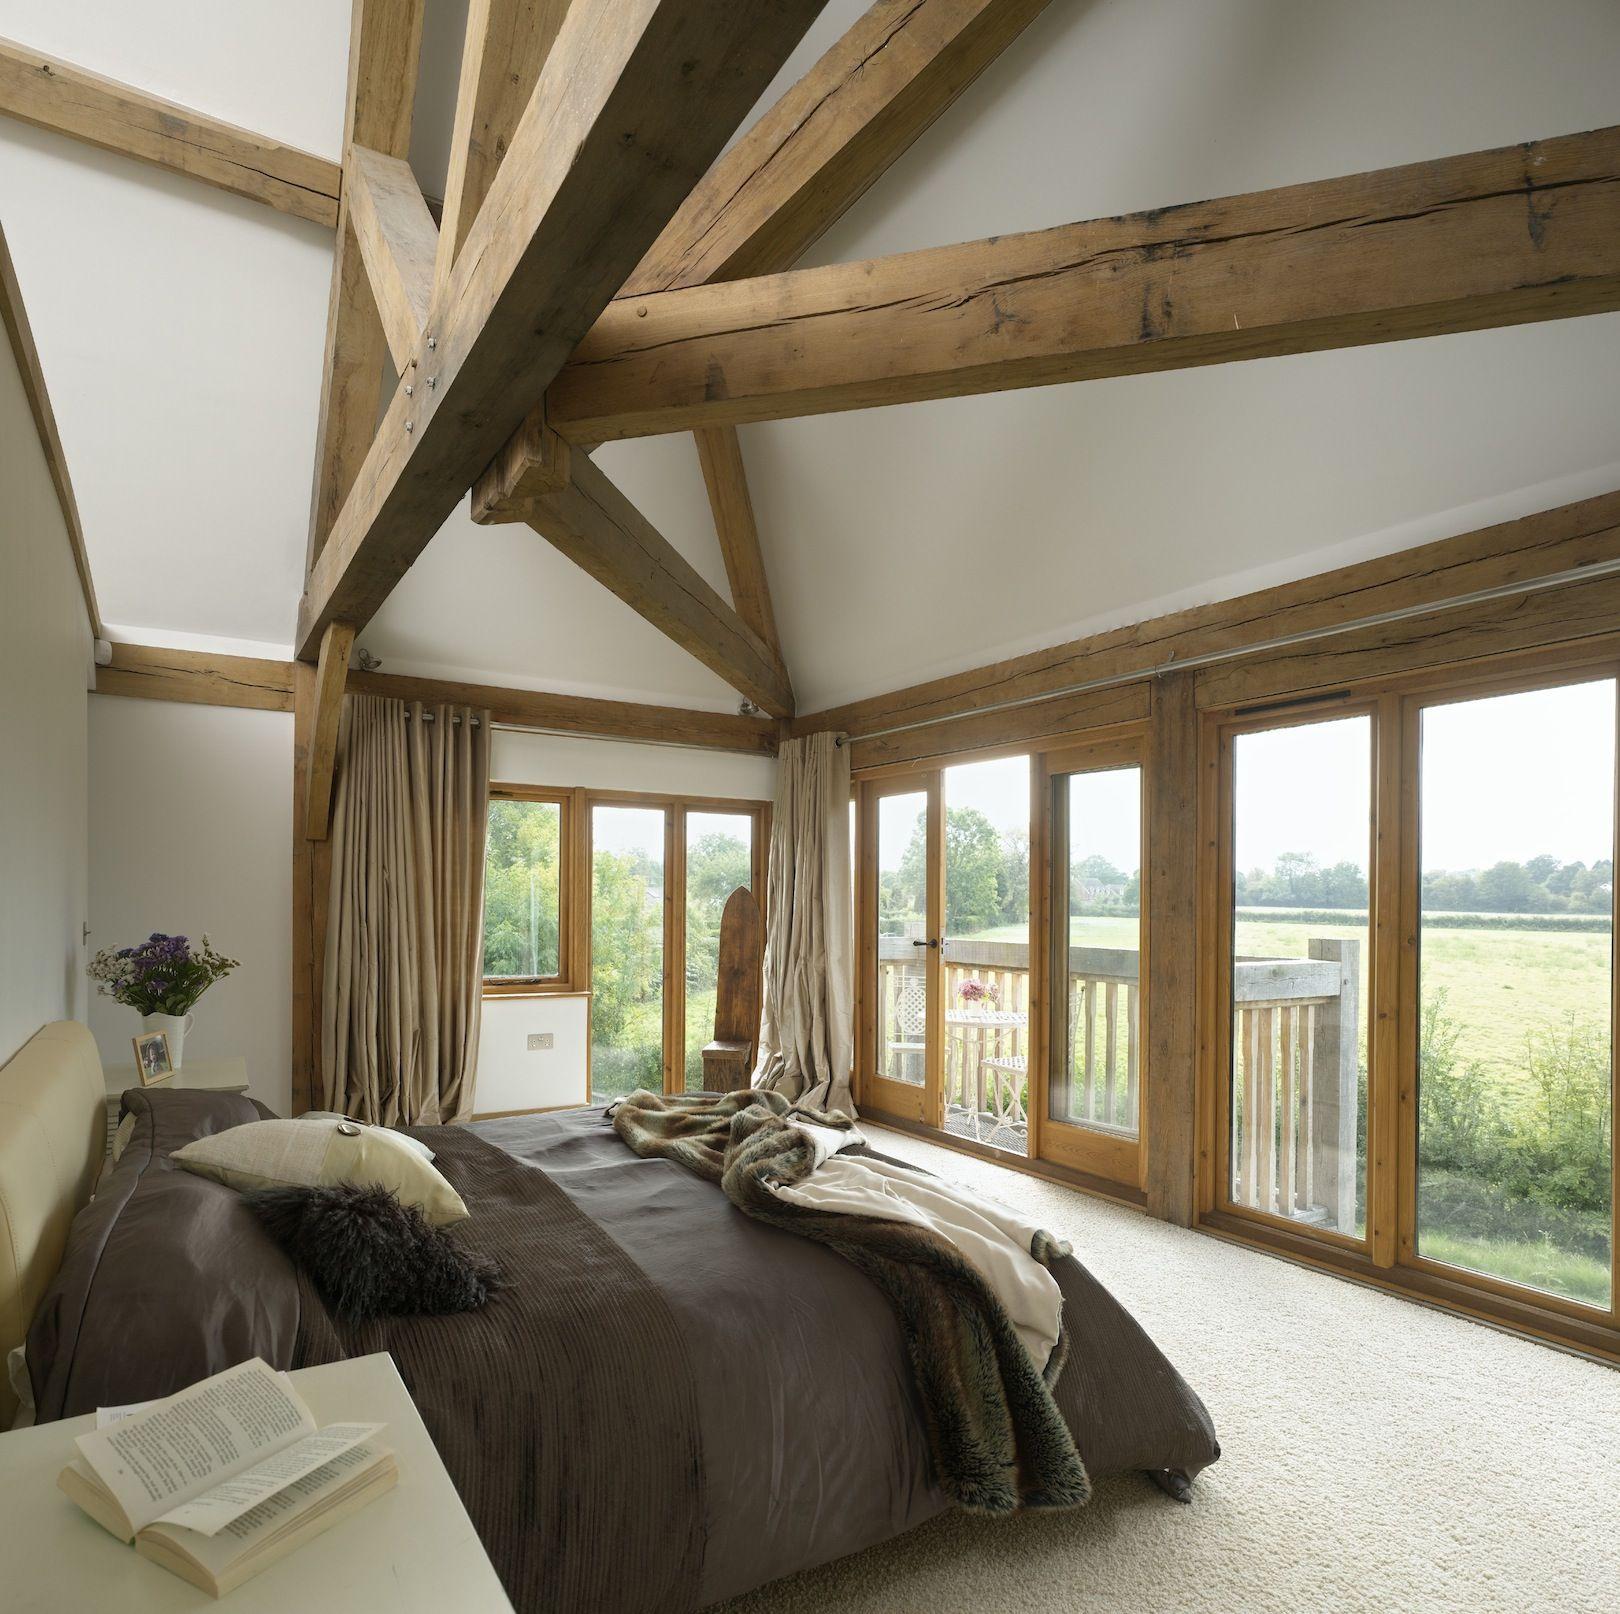 Best Border Oak Barn Bedroom With Impressive Framing Barn 400 x 300